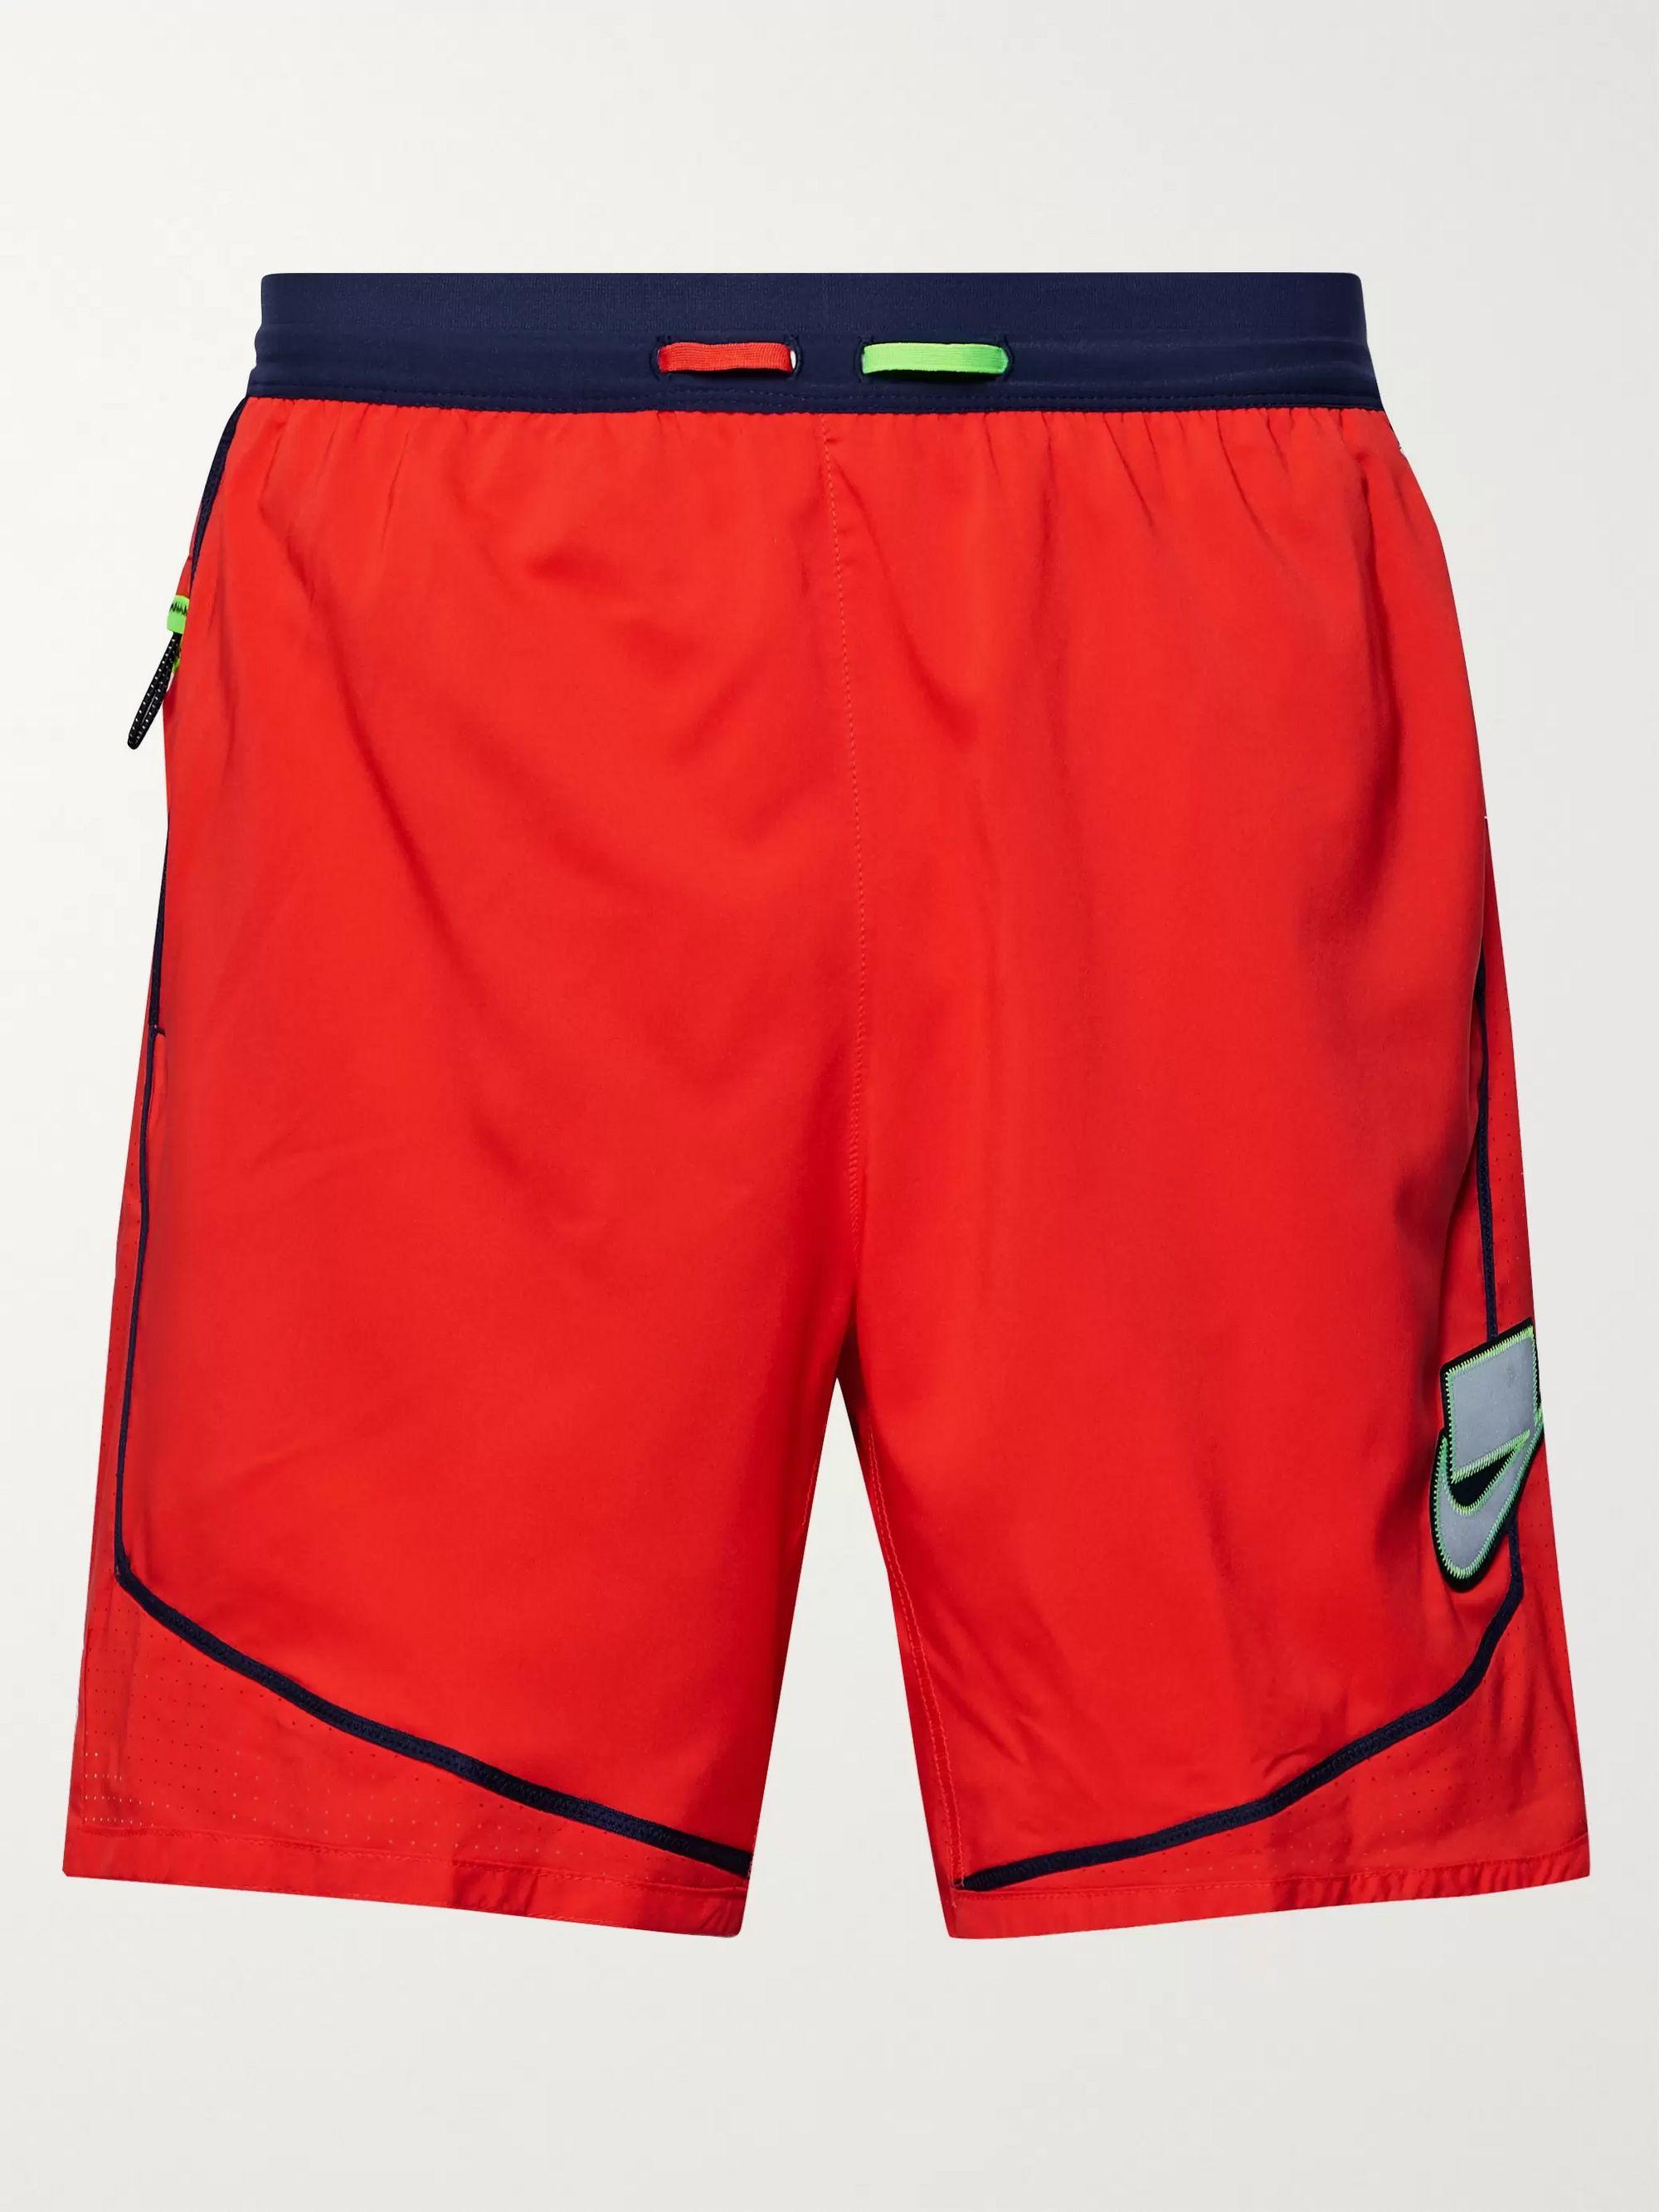 Wild Run Dri Fit Shorts by Nike Running